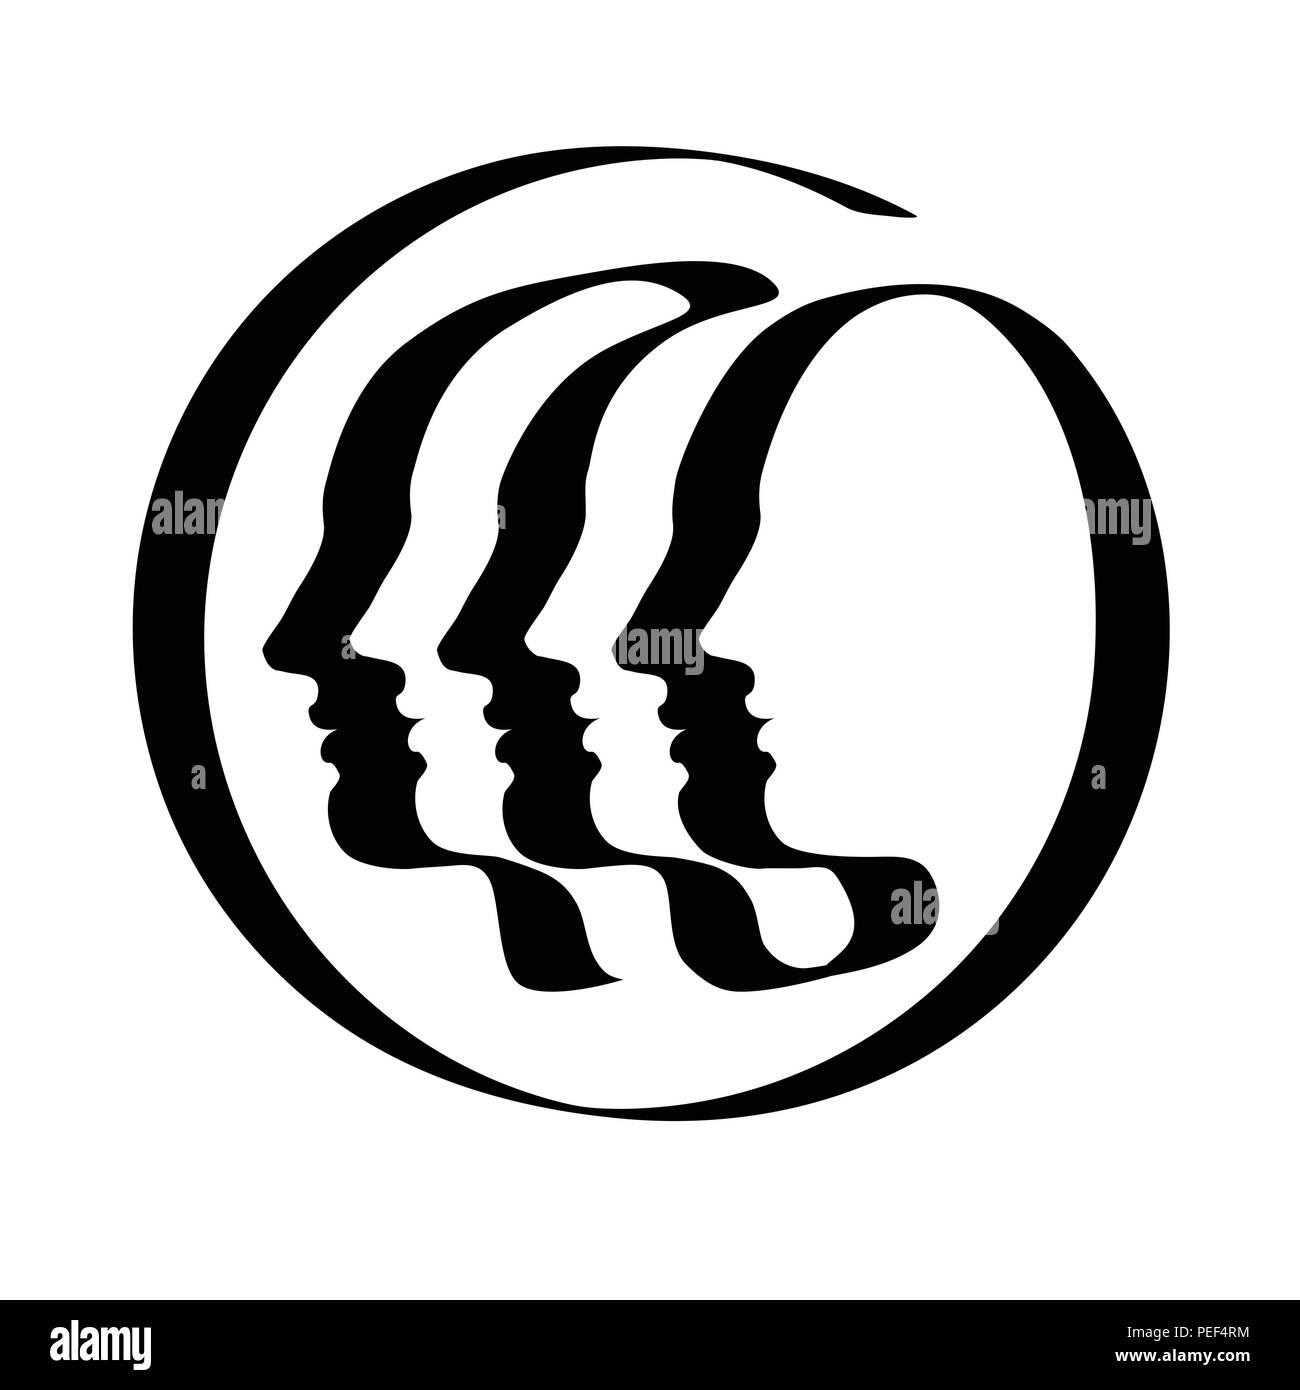 Three Or Six Human Profile Drawn By Ribbon Like Single Line